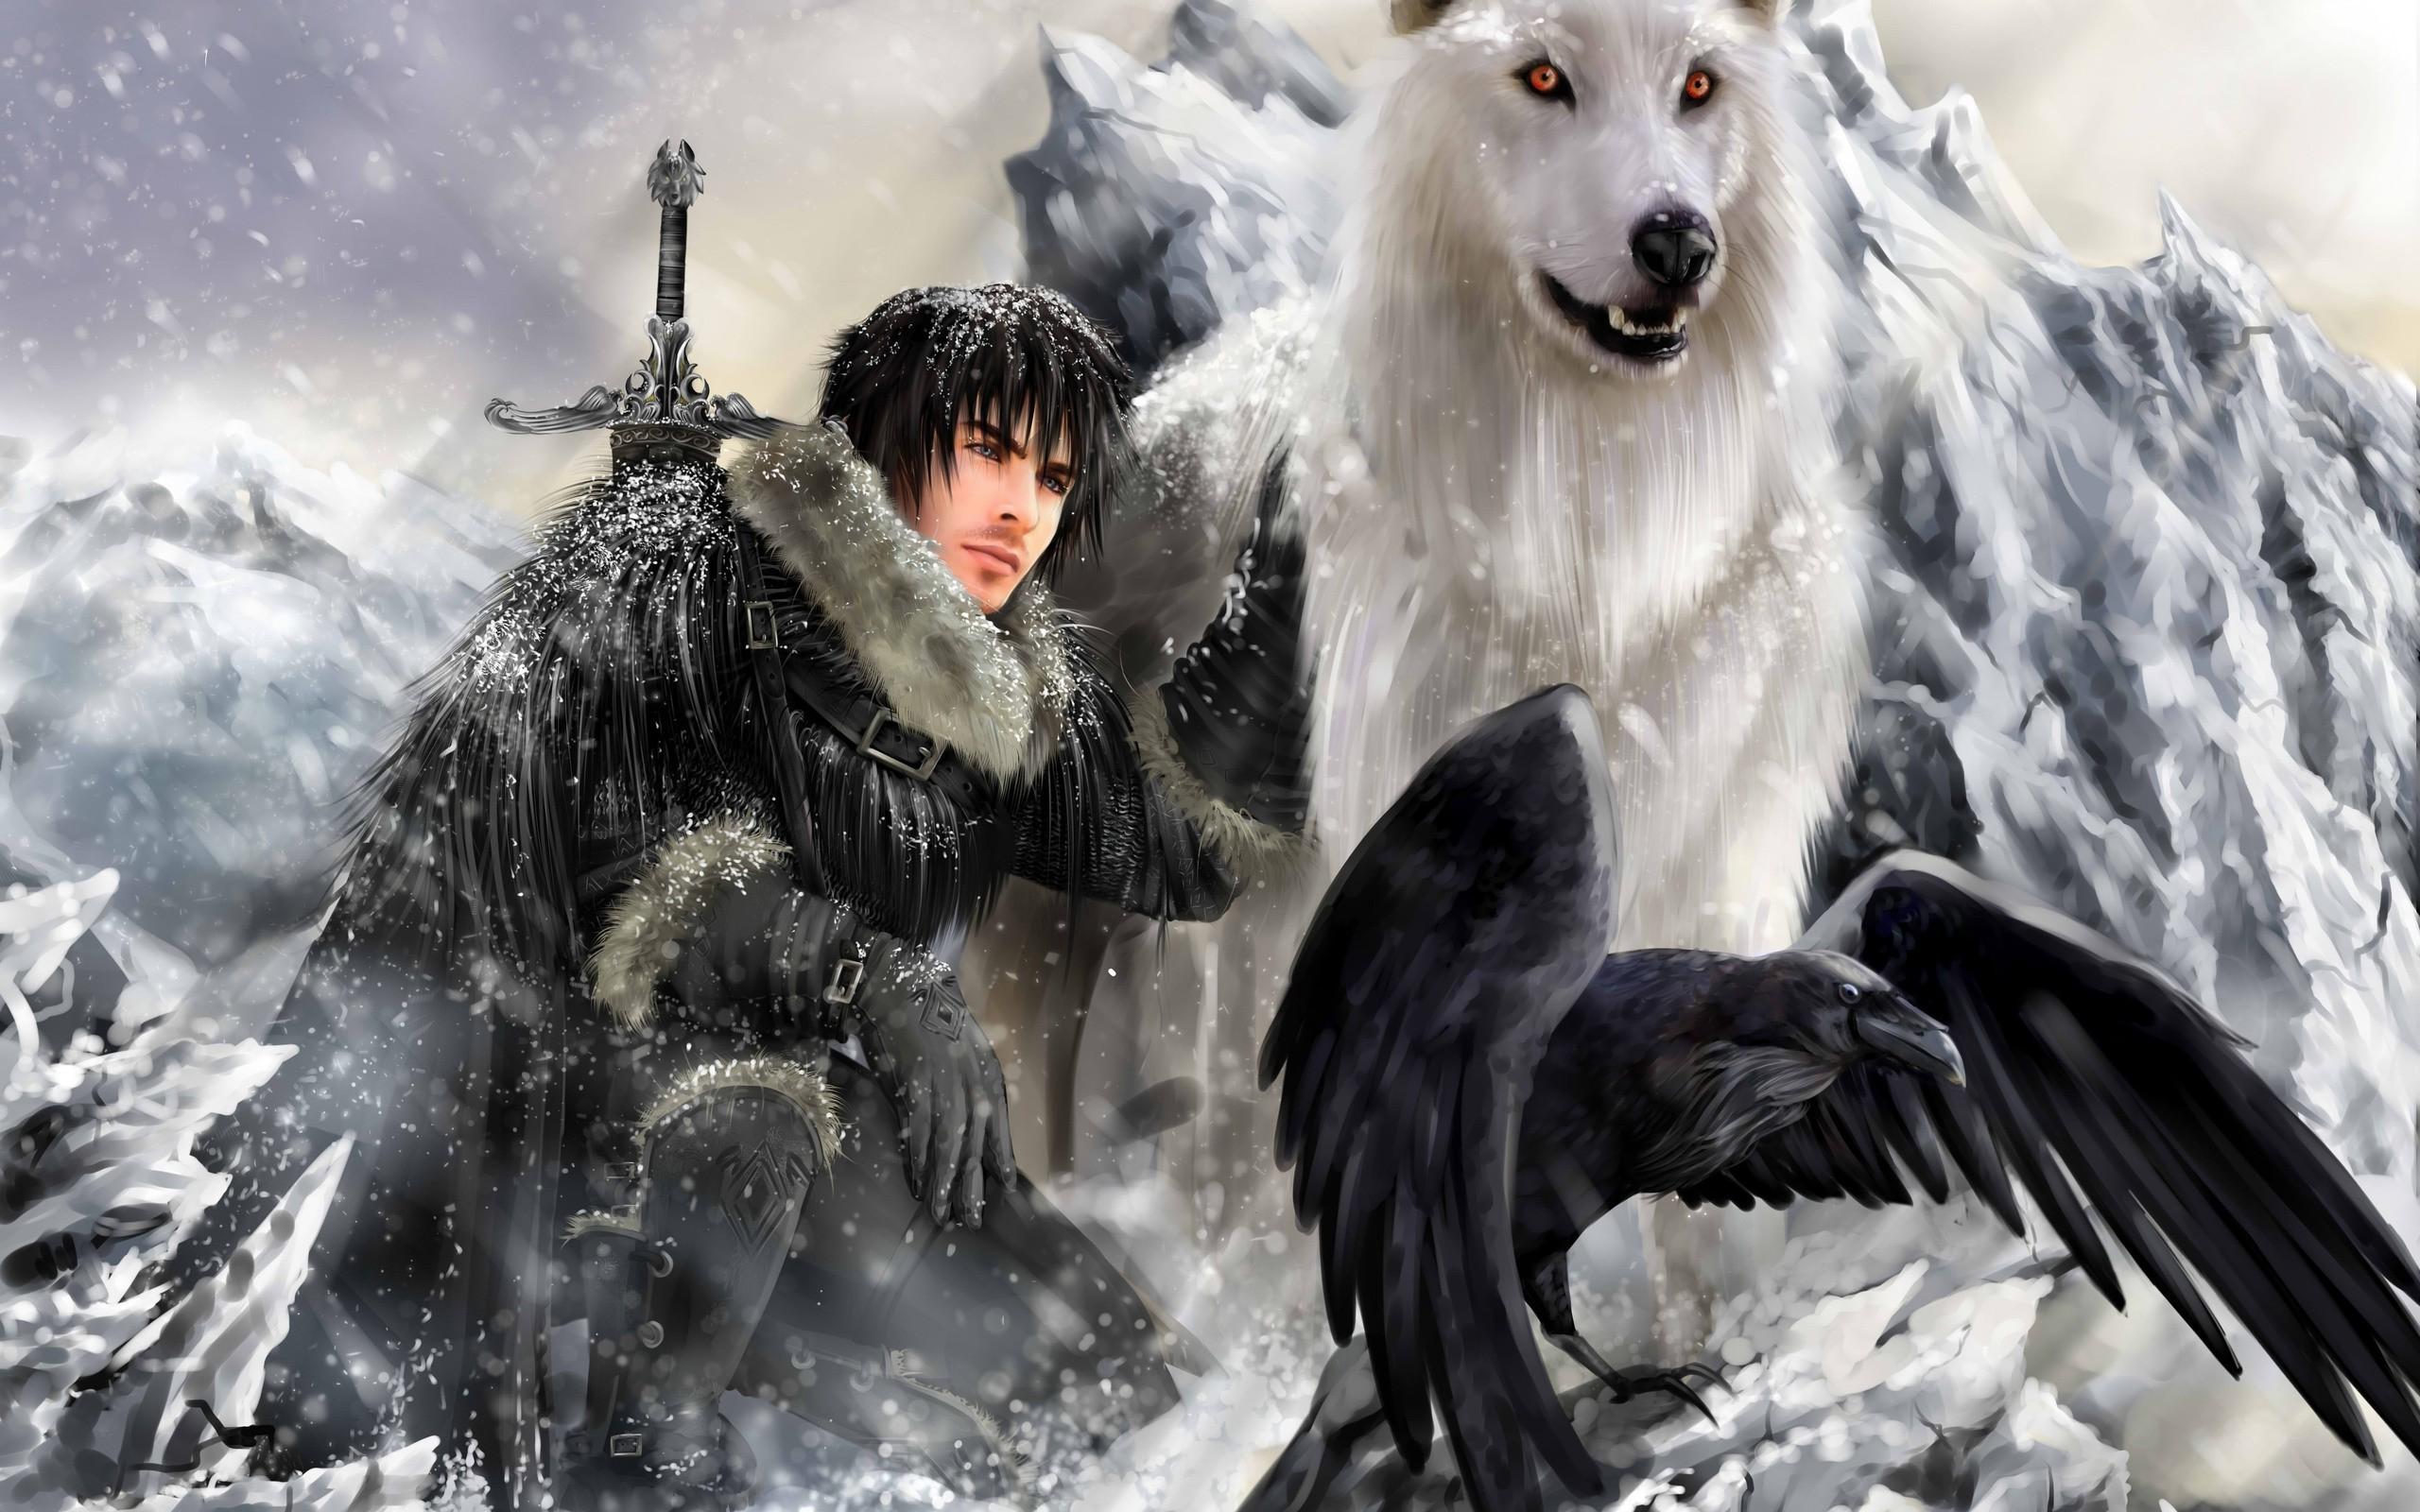 49+ Game of Thrones Wallpaper 2560x1440 on WallpaperSafari